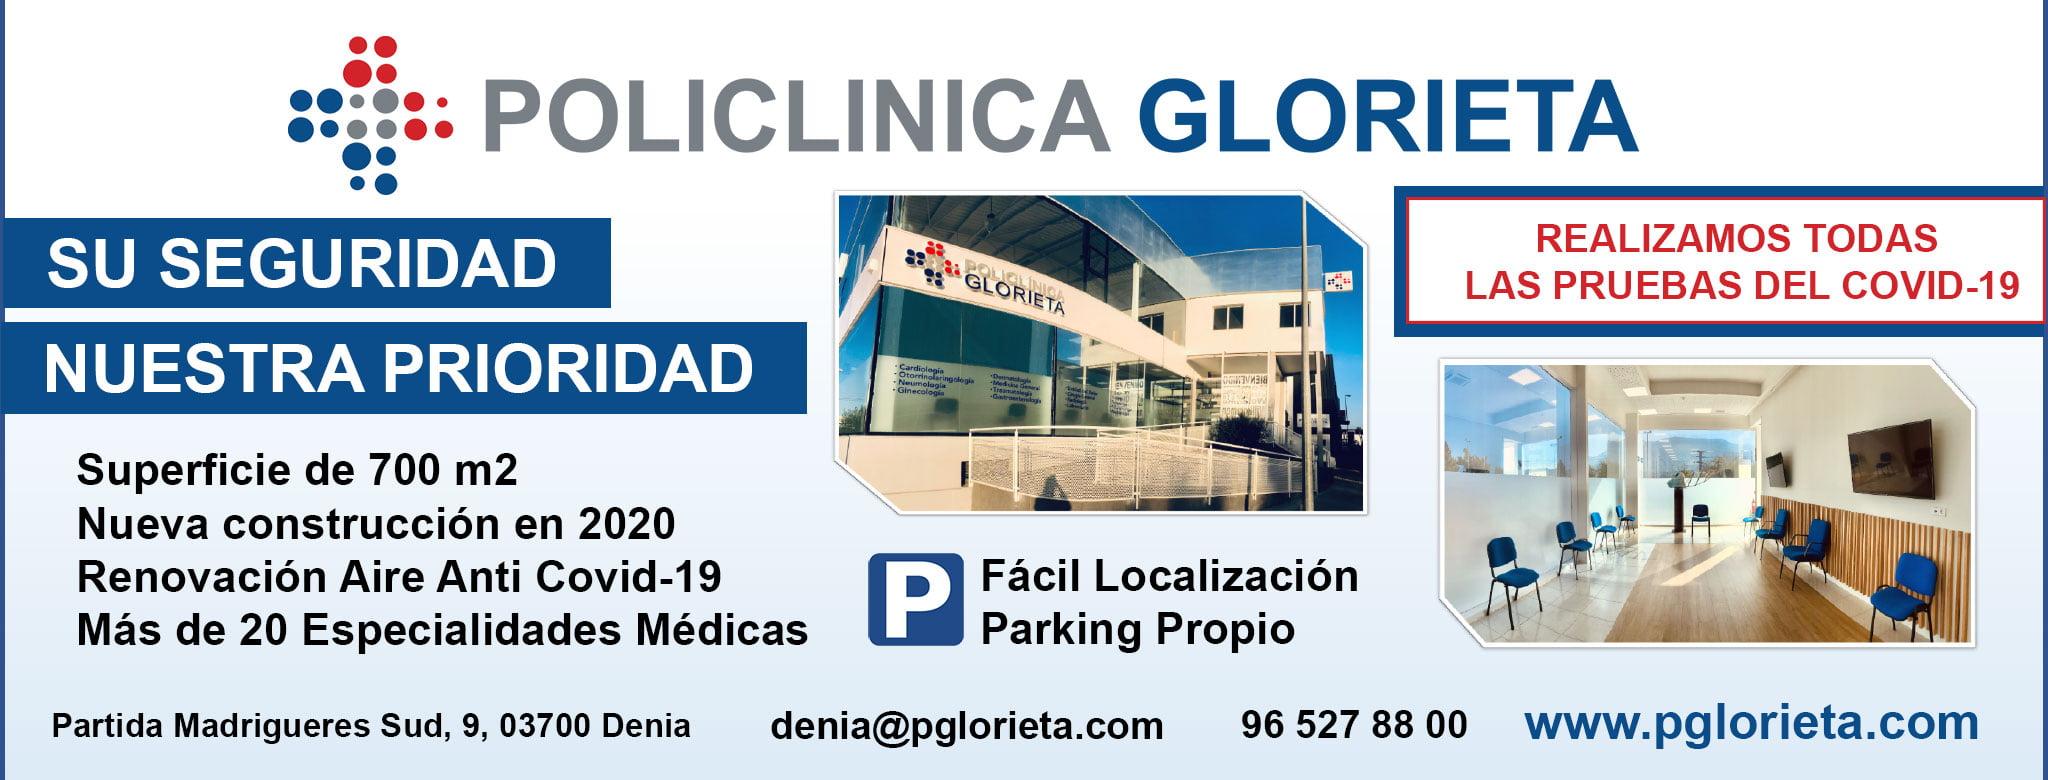 Sécurité anti-Covid 19 à la polyclinique Glorieta